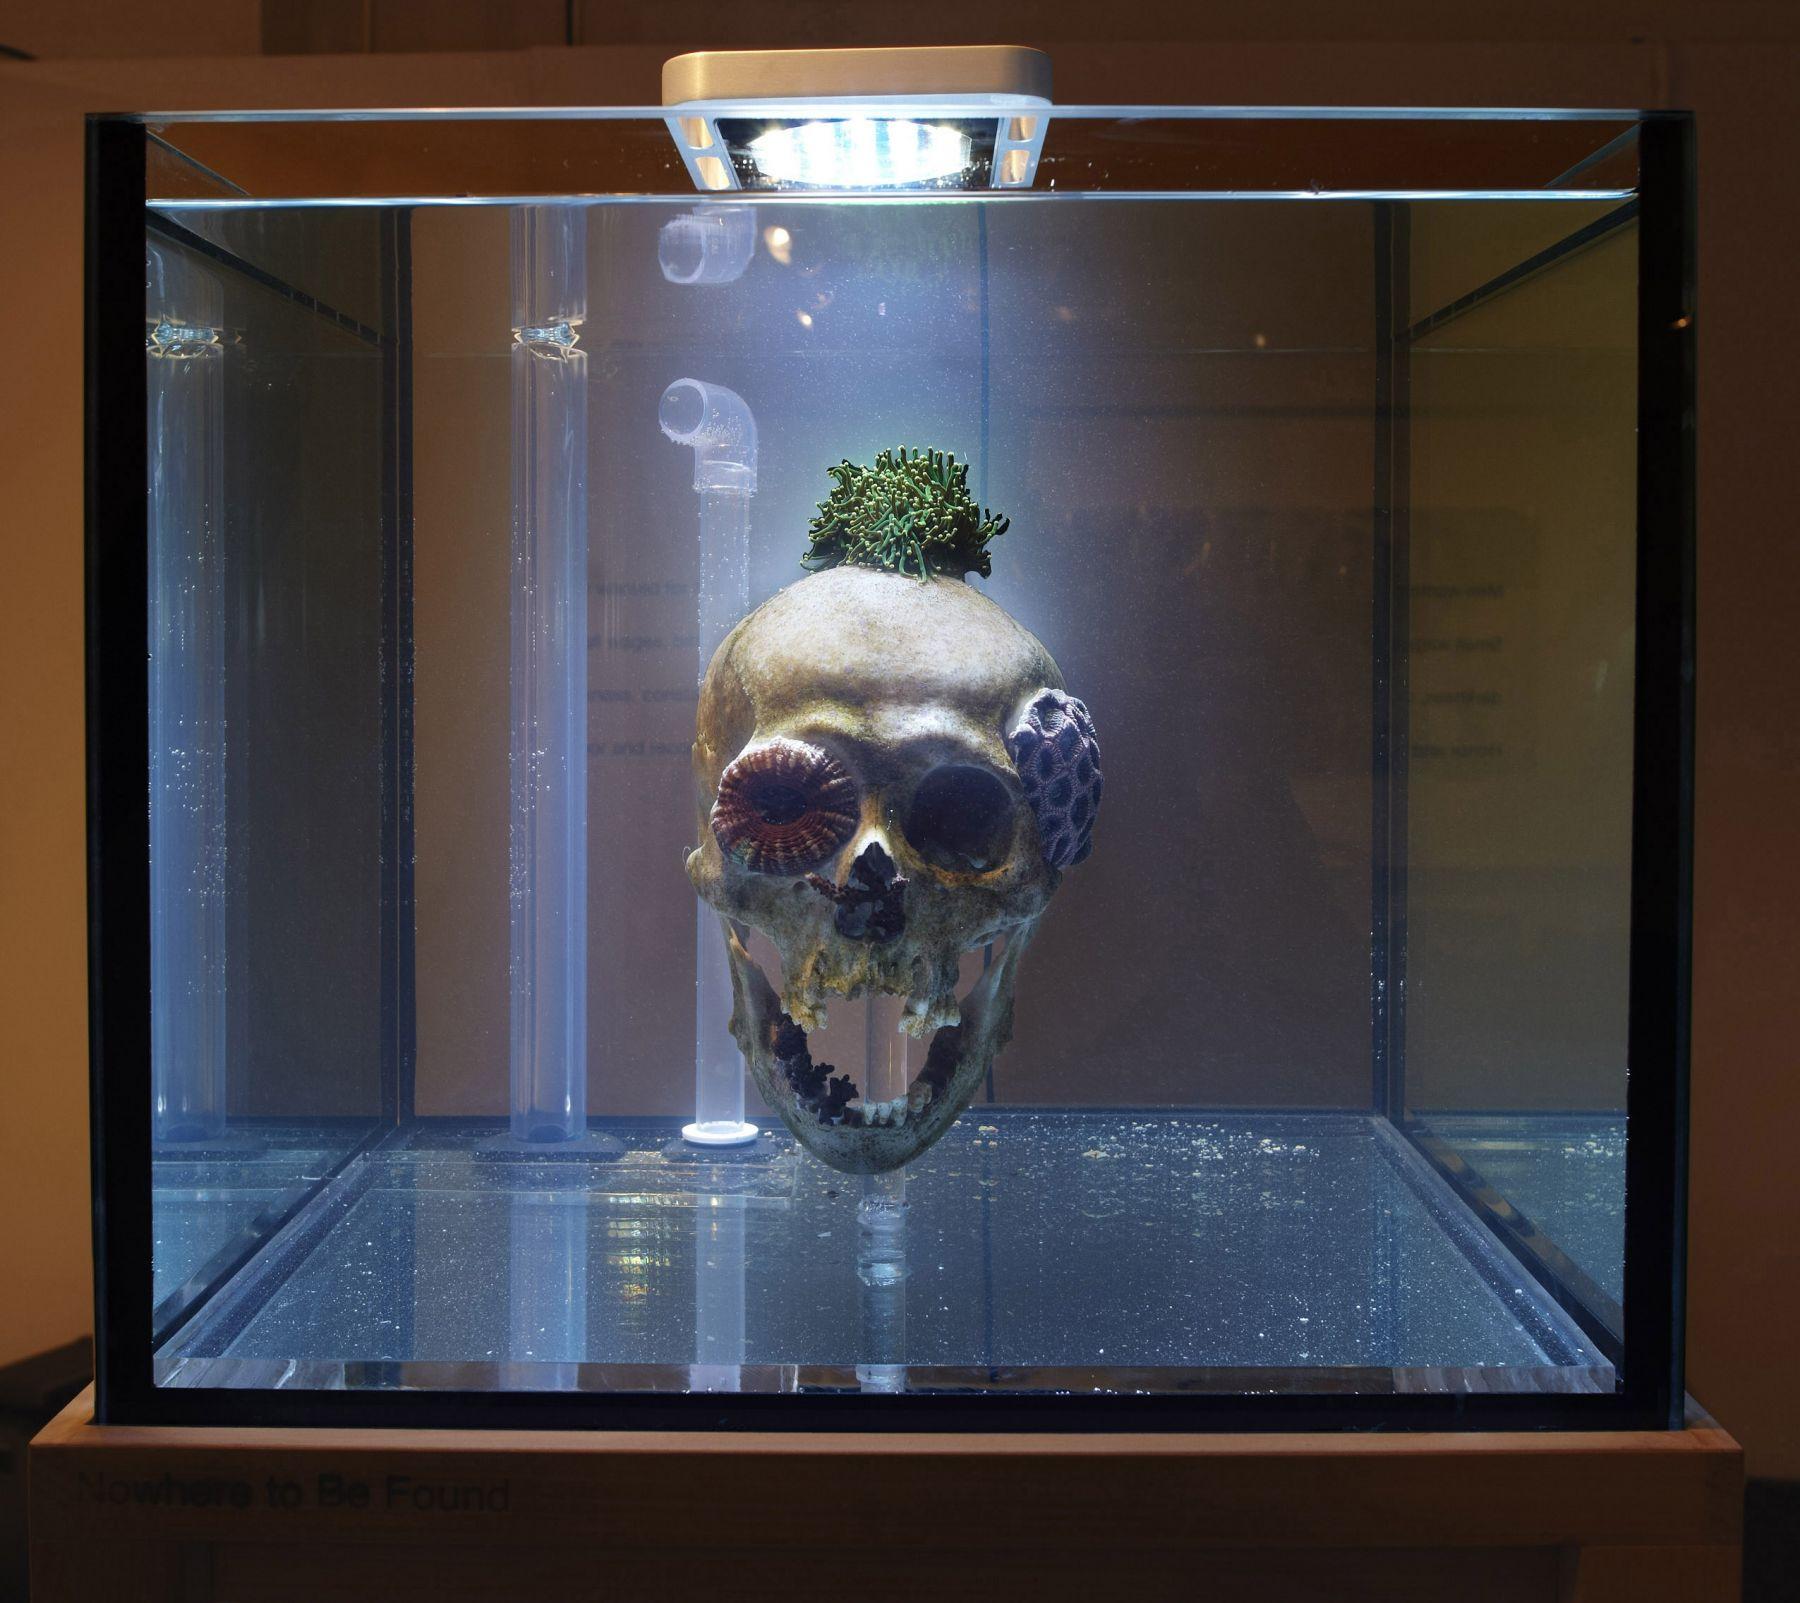 skull in an aquarium tank by mathias kessler